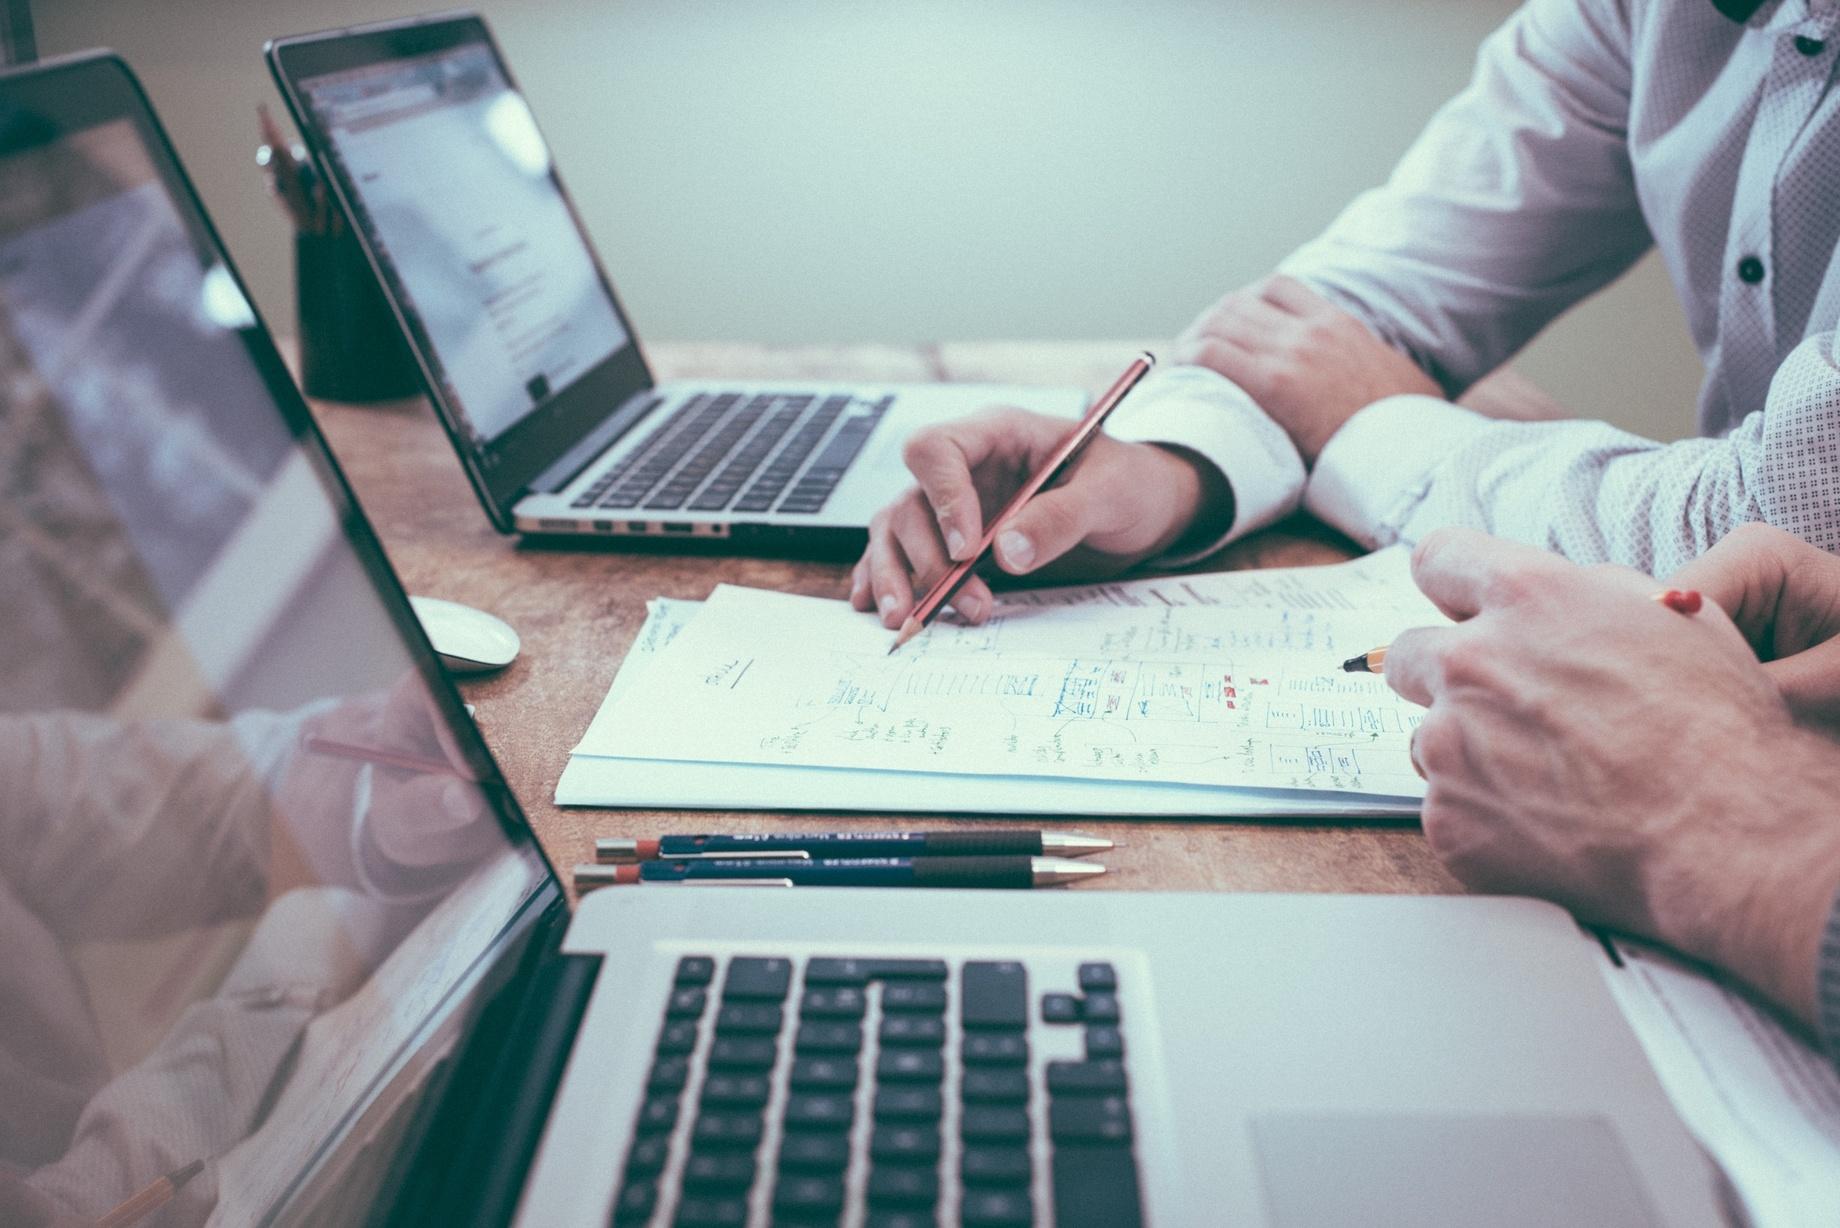 Our GDPR Compliance Checklist